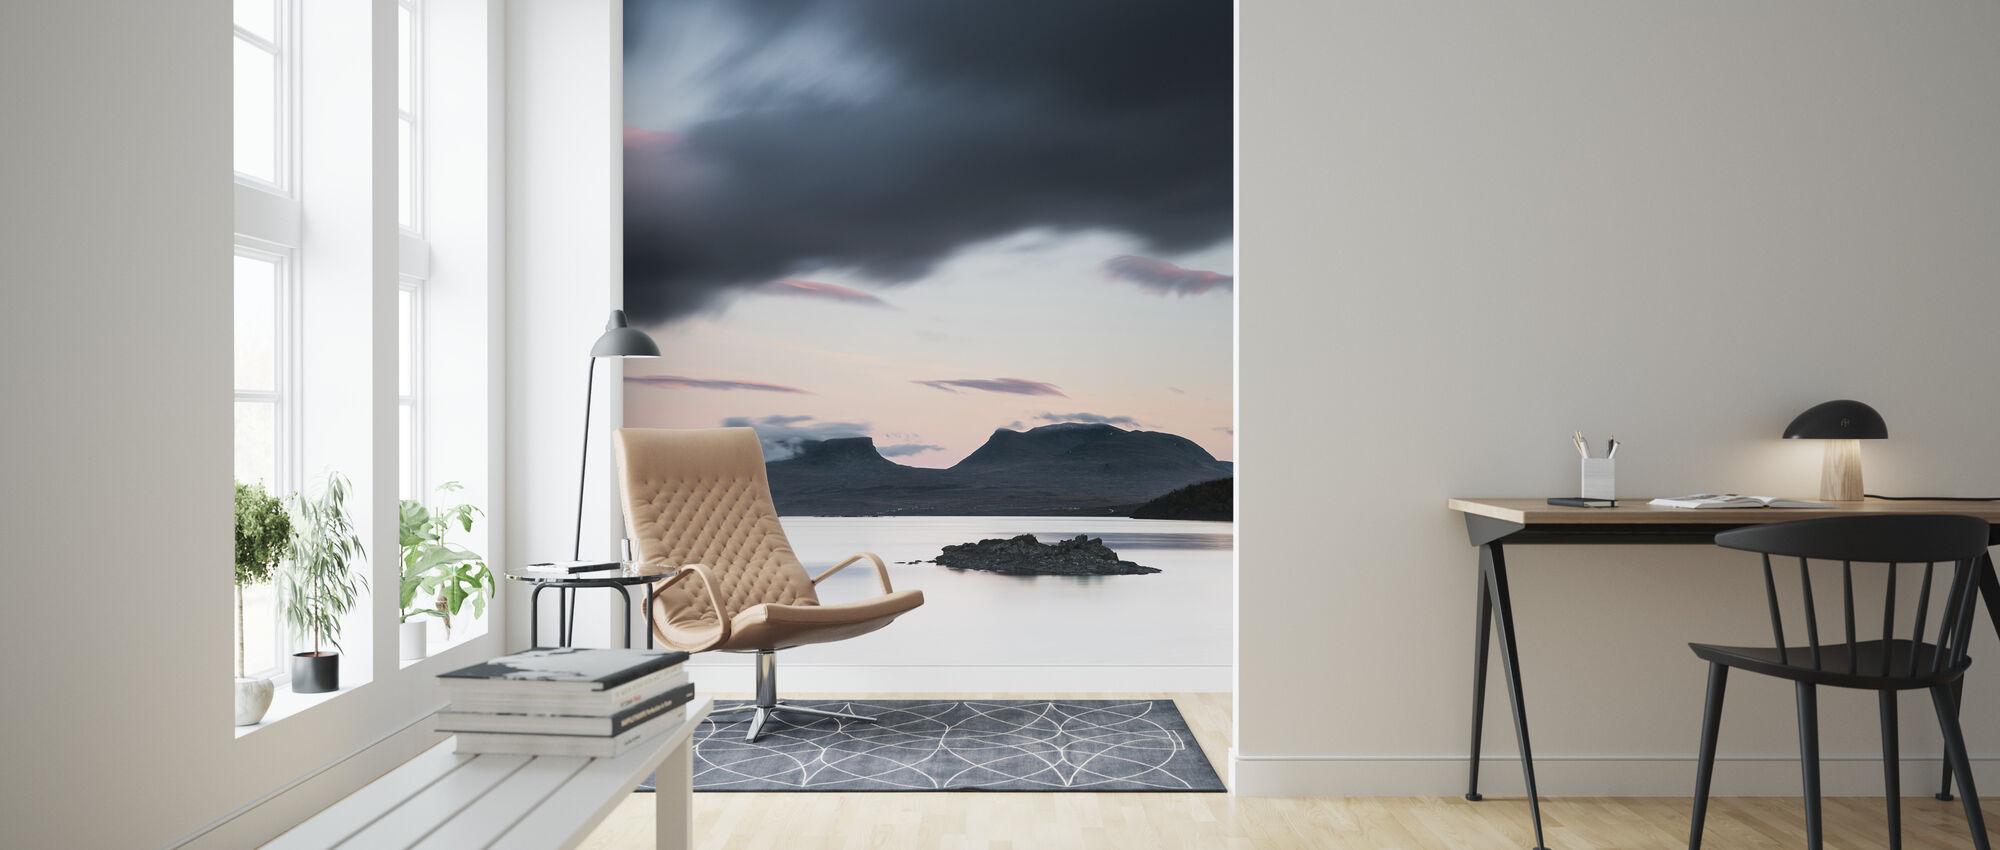 Lapporten & Torneträsk - Sweden - Wallpaper - Living Room